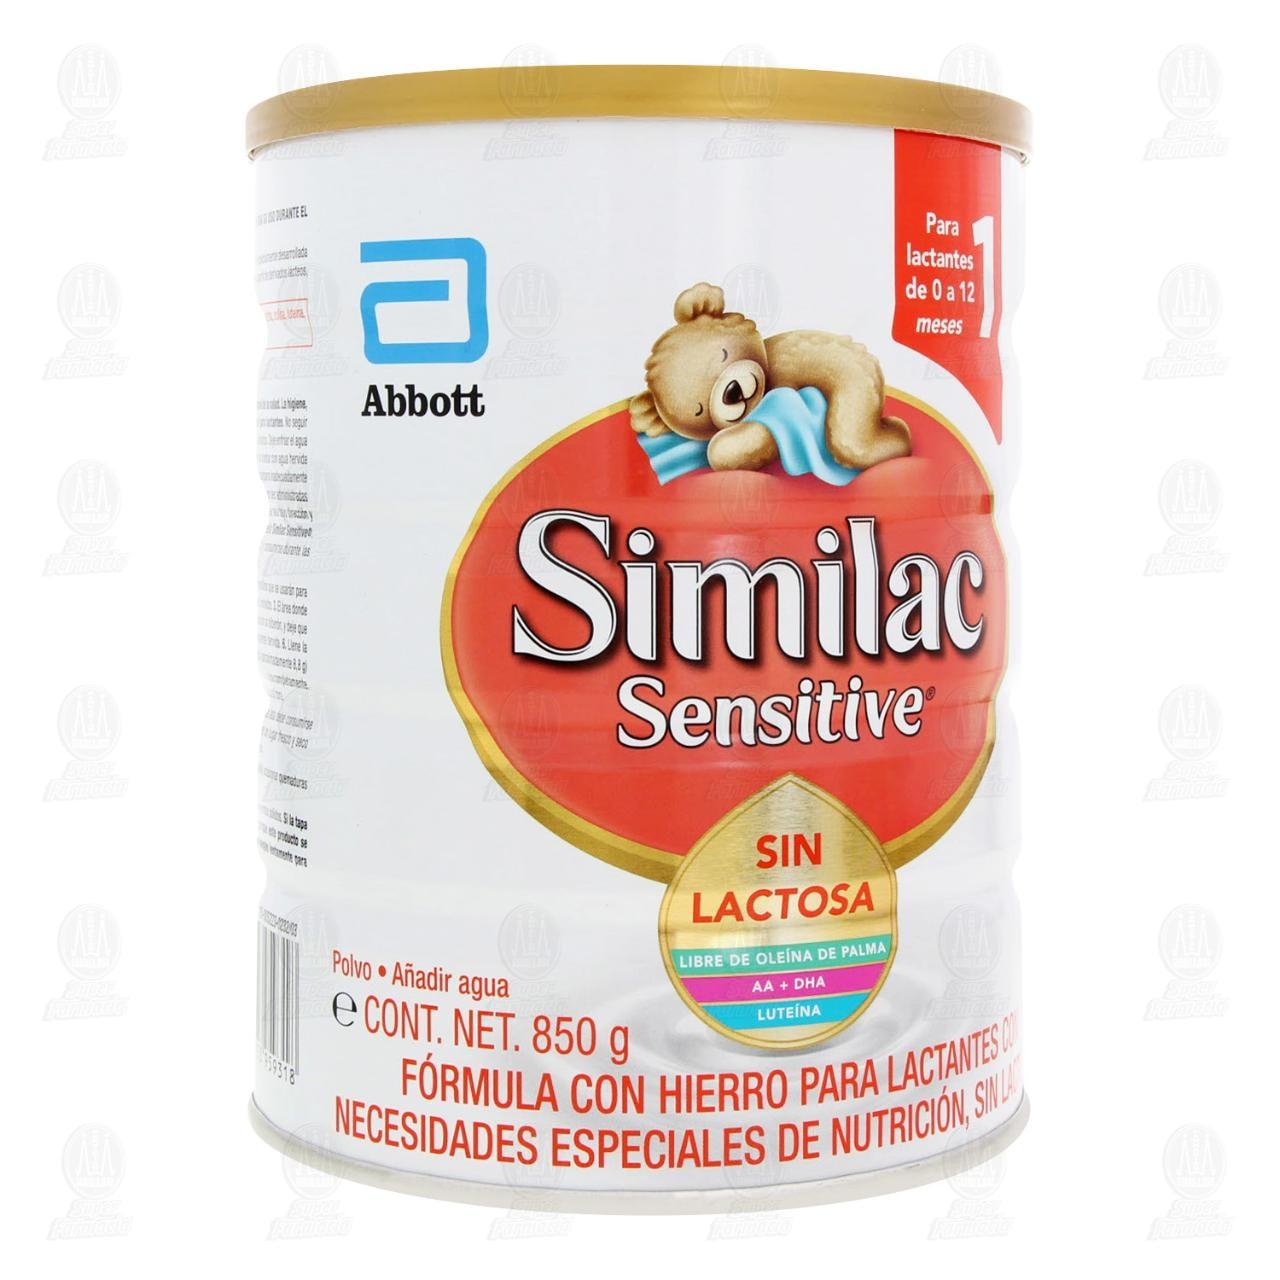 Comprar Fórmula Infantil Similac Sensitive 1 Sin Lactosa en Polvo (Edad 0-12 Meses), 850 gr. en Farmacias Guadalajara